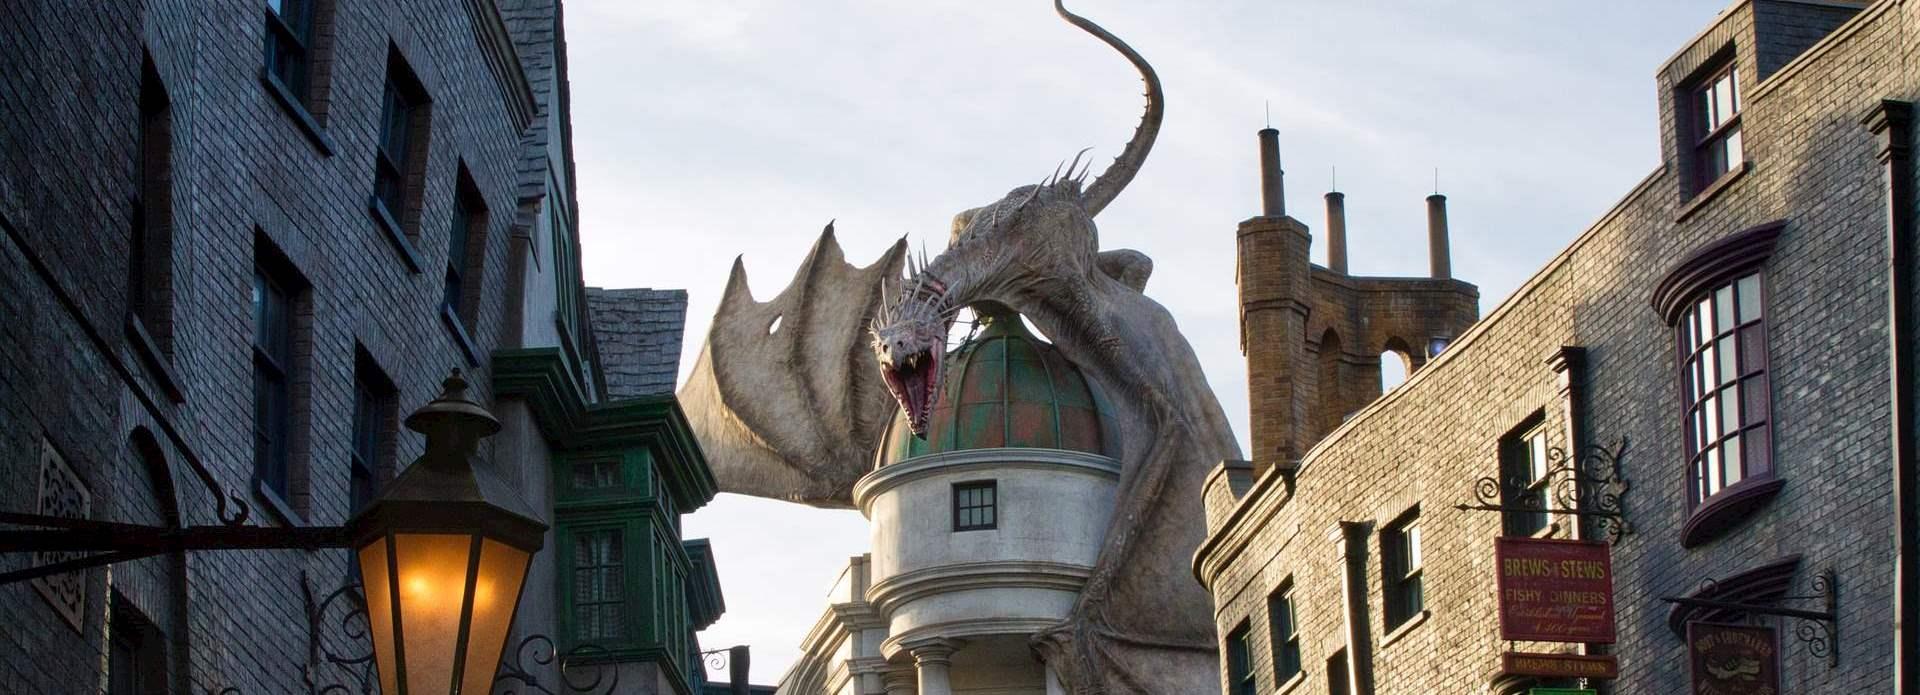 Universal Studios of Orlando, Florida Resort